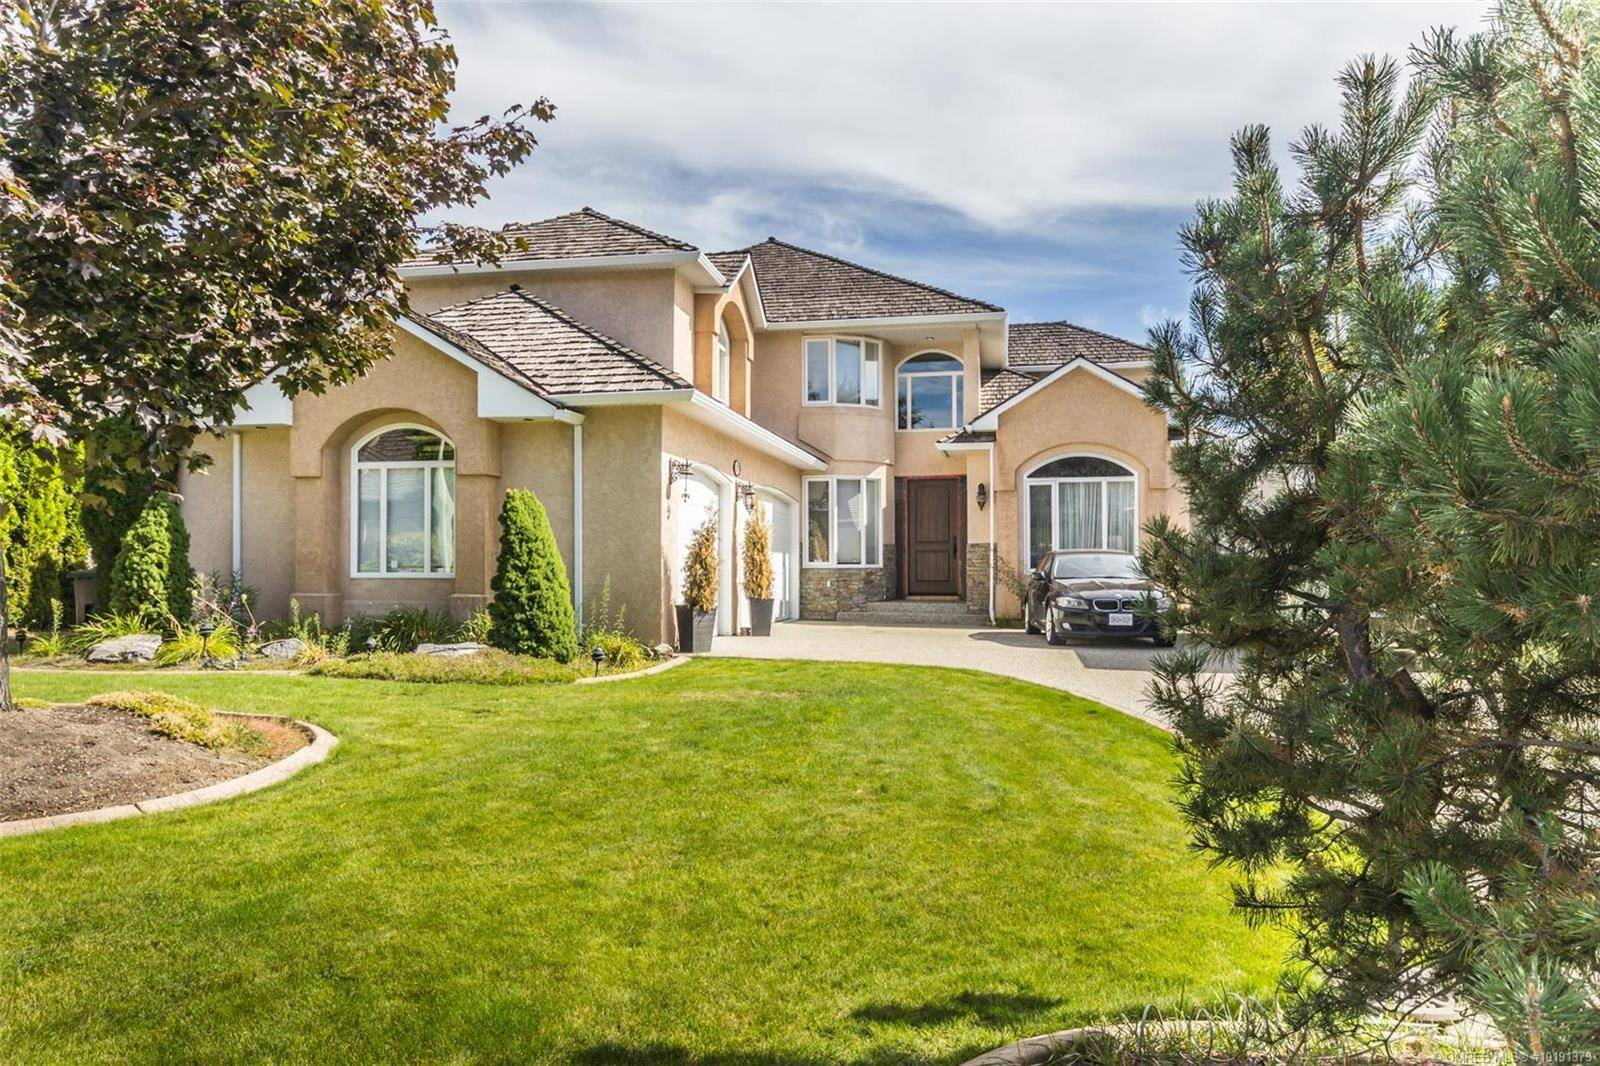 House for sale at 2177 Breckenridge Ct Kelowna British Columbia - MLS: 10191379